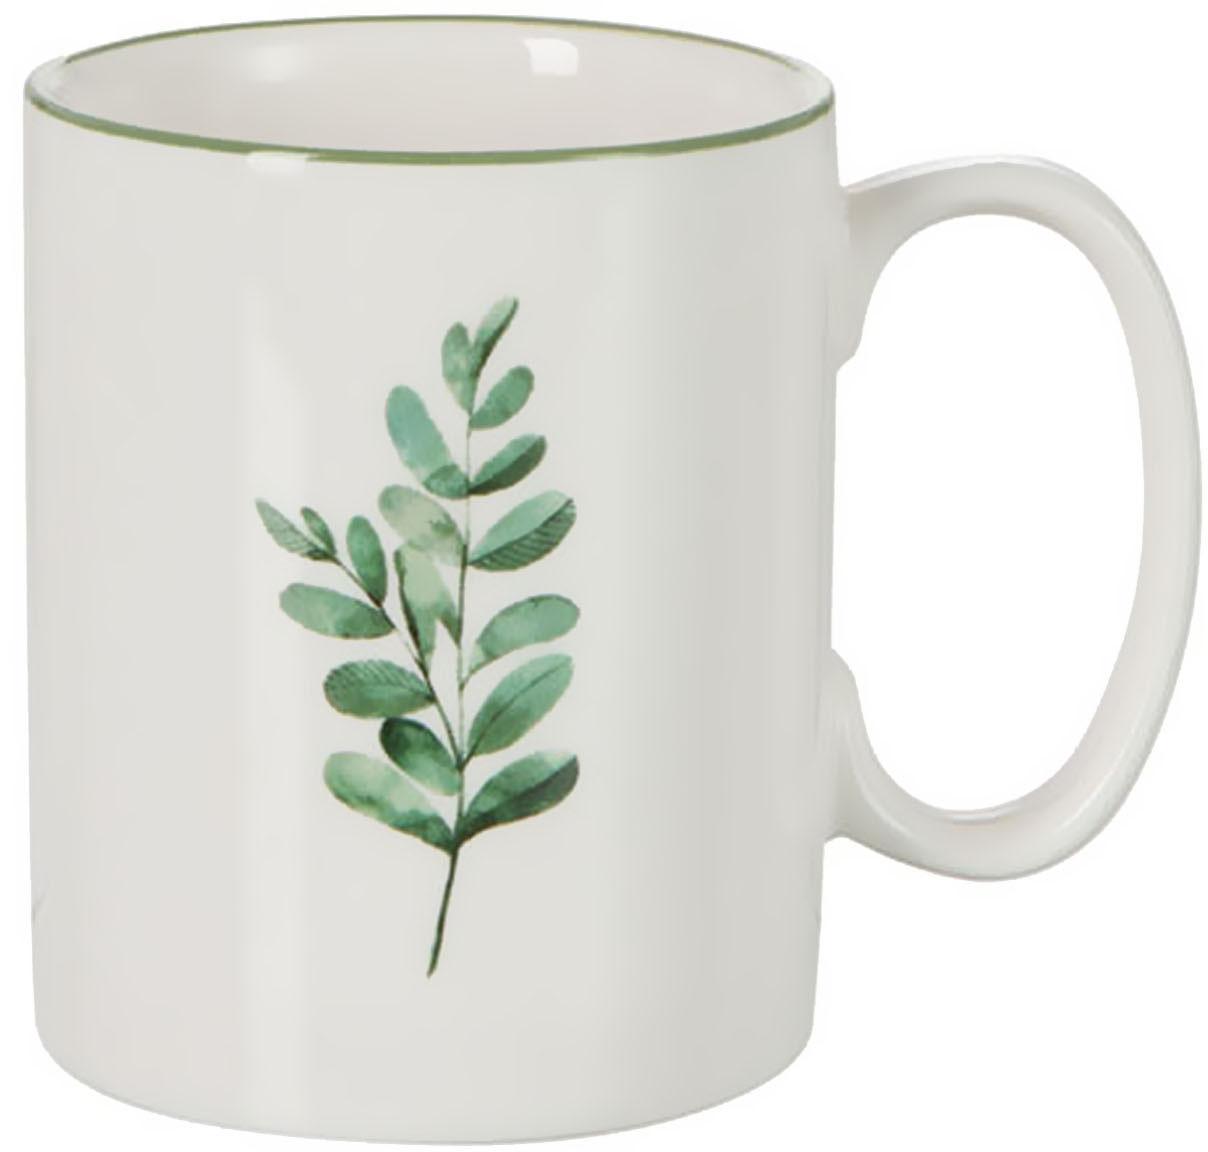 Tazas Eukalyptus, 6uds., Porcelana, Blanco, verde, Ø 8 cm